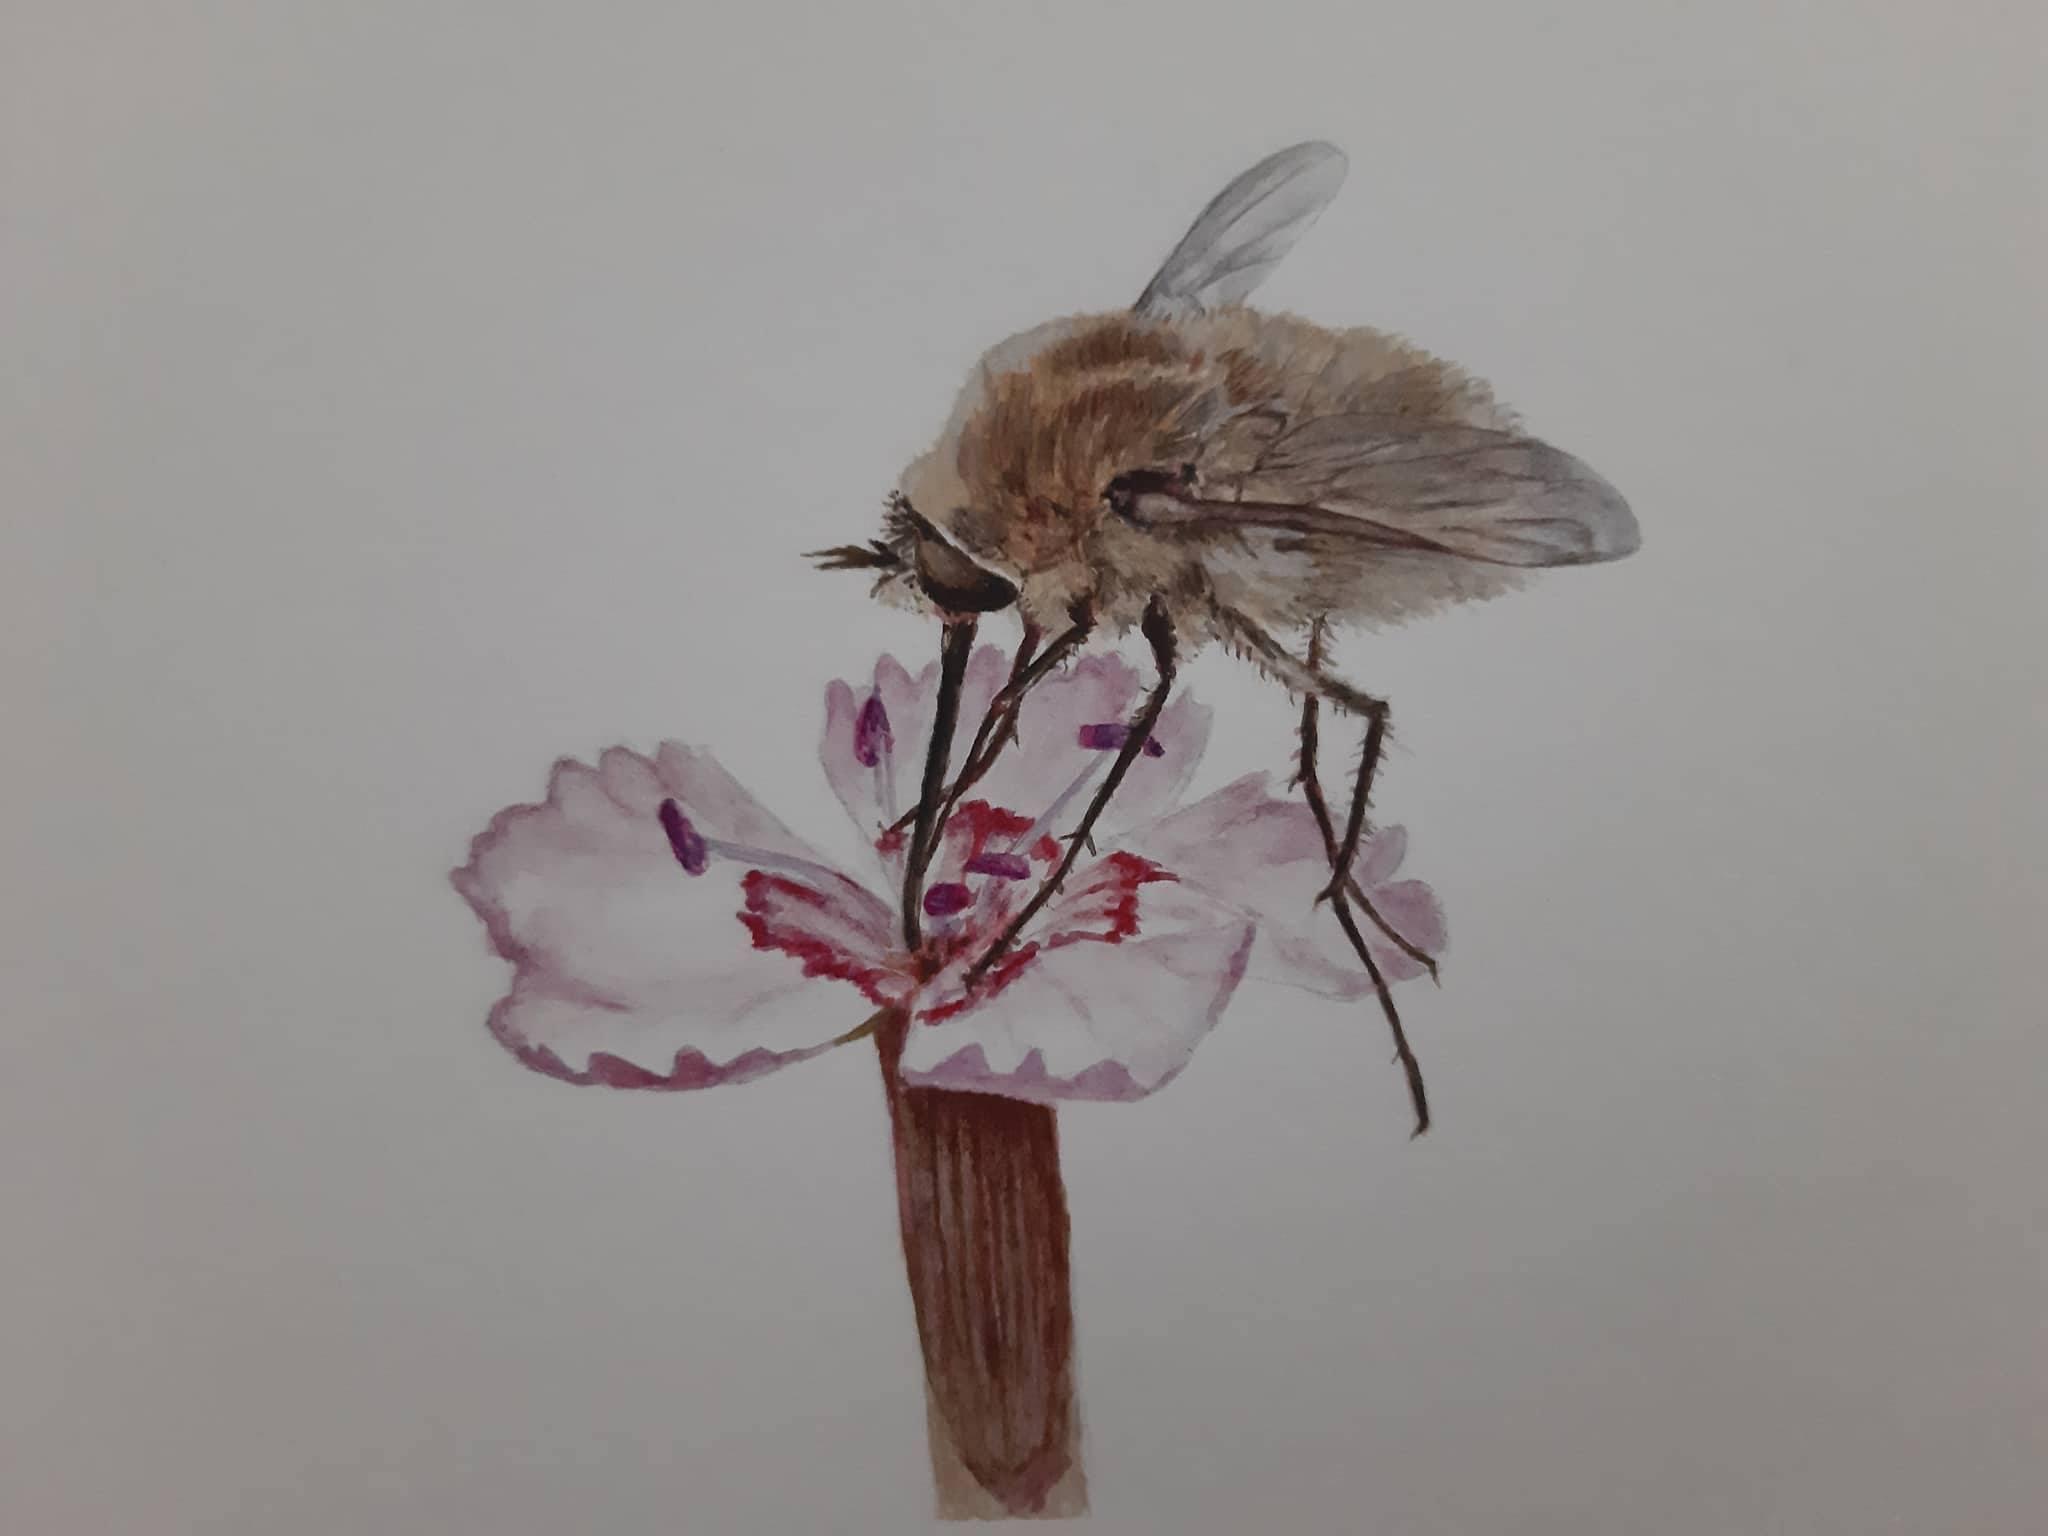 Kniha doplnená realistickými maľbami od Sylvie Pabst